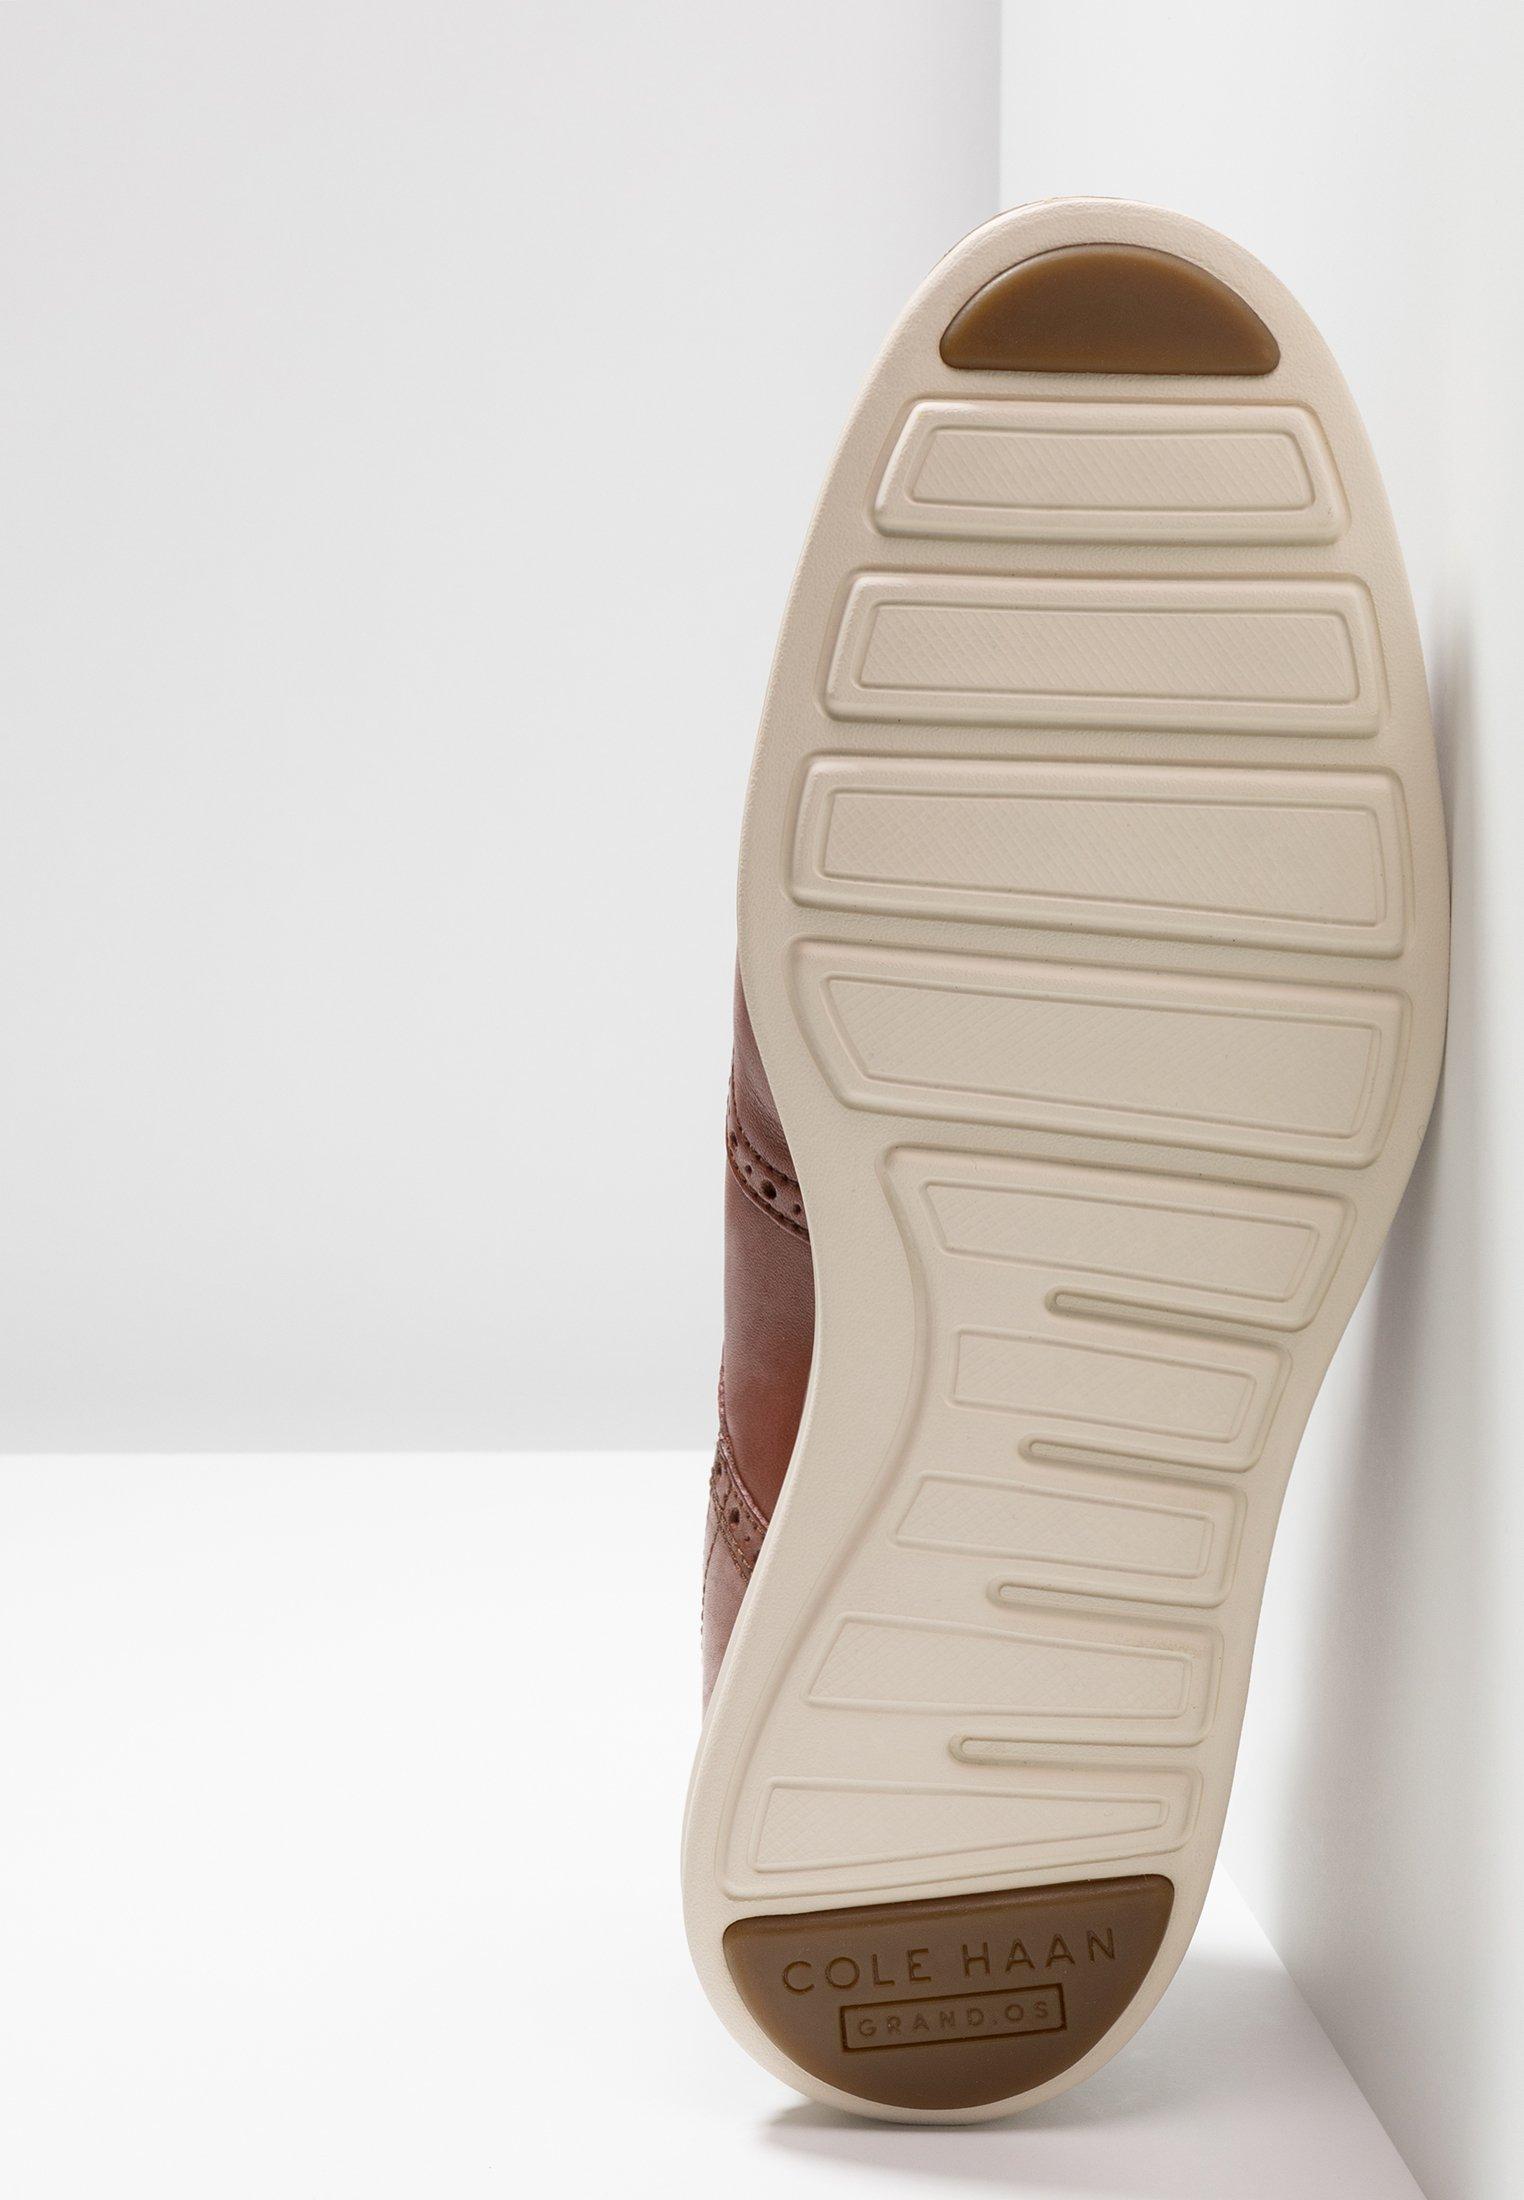 Meilleurs prix Cole Haan ORIGINAL GRAND WINGTIP OXFORD Chaussures à lacets woodbury/ivory